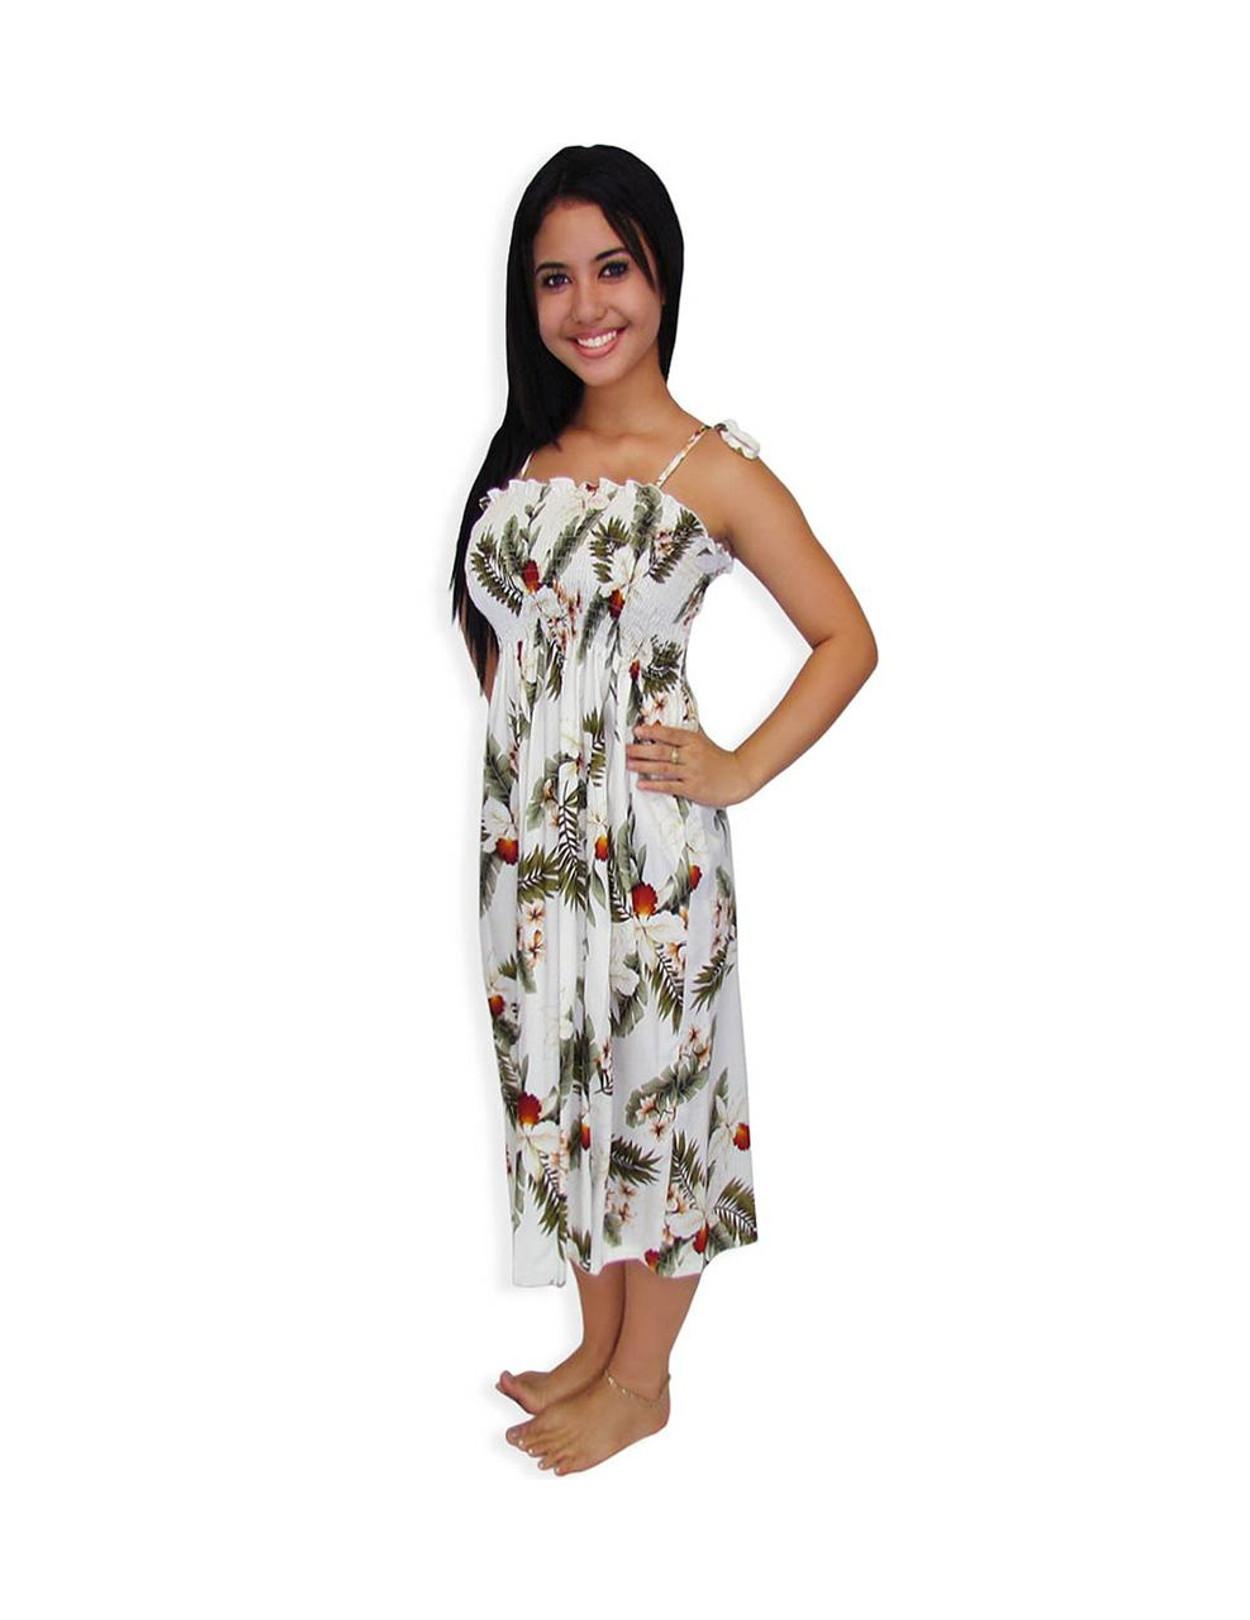 ba68d41da17 Hanapepe Tube-Top Mid-Length Smocked Dress